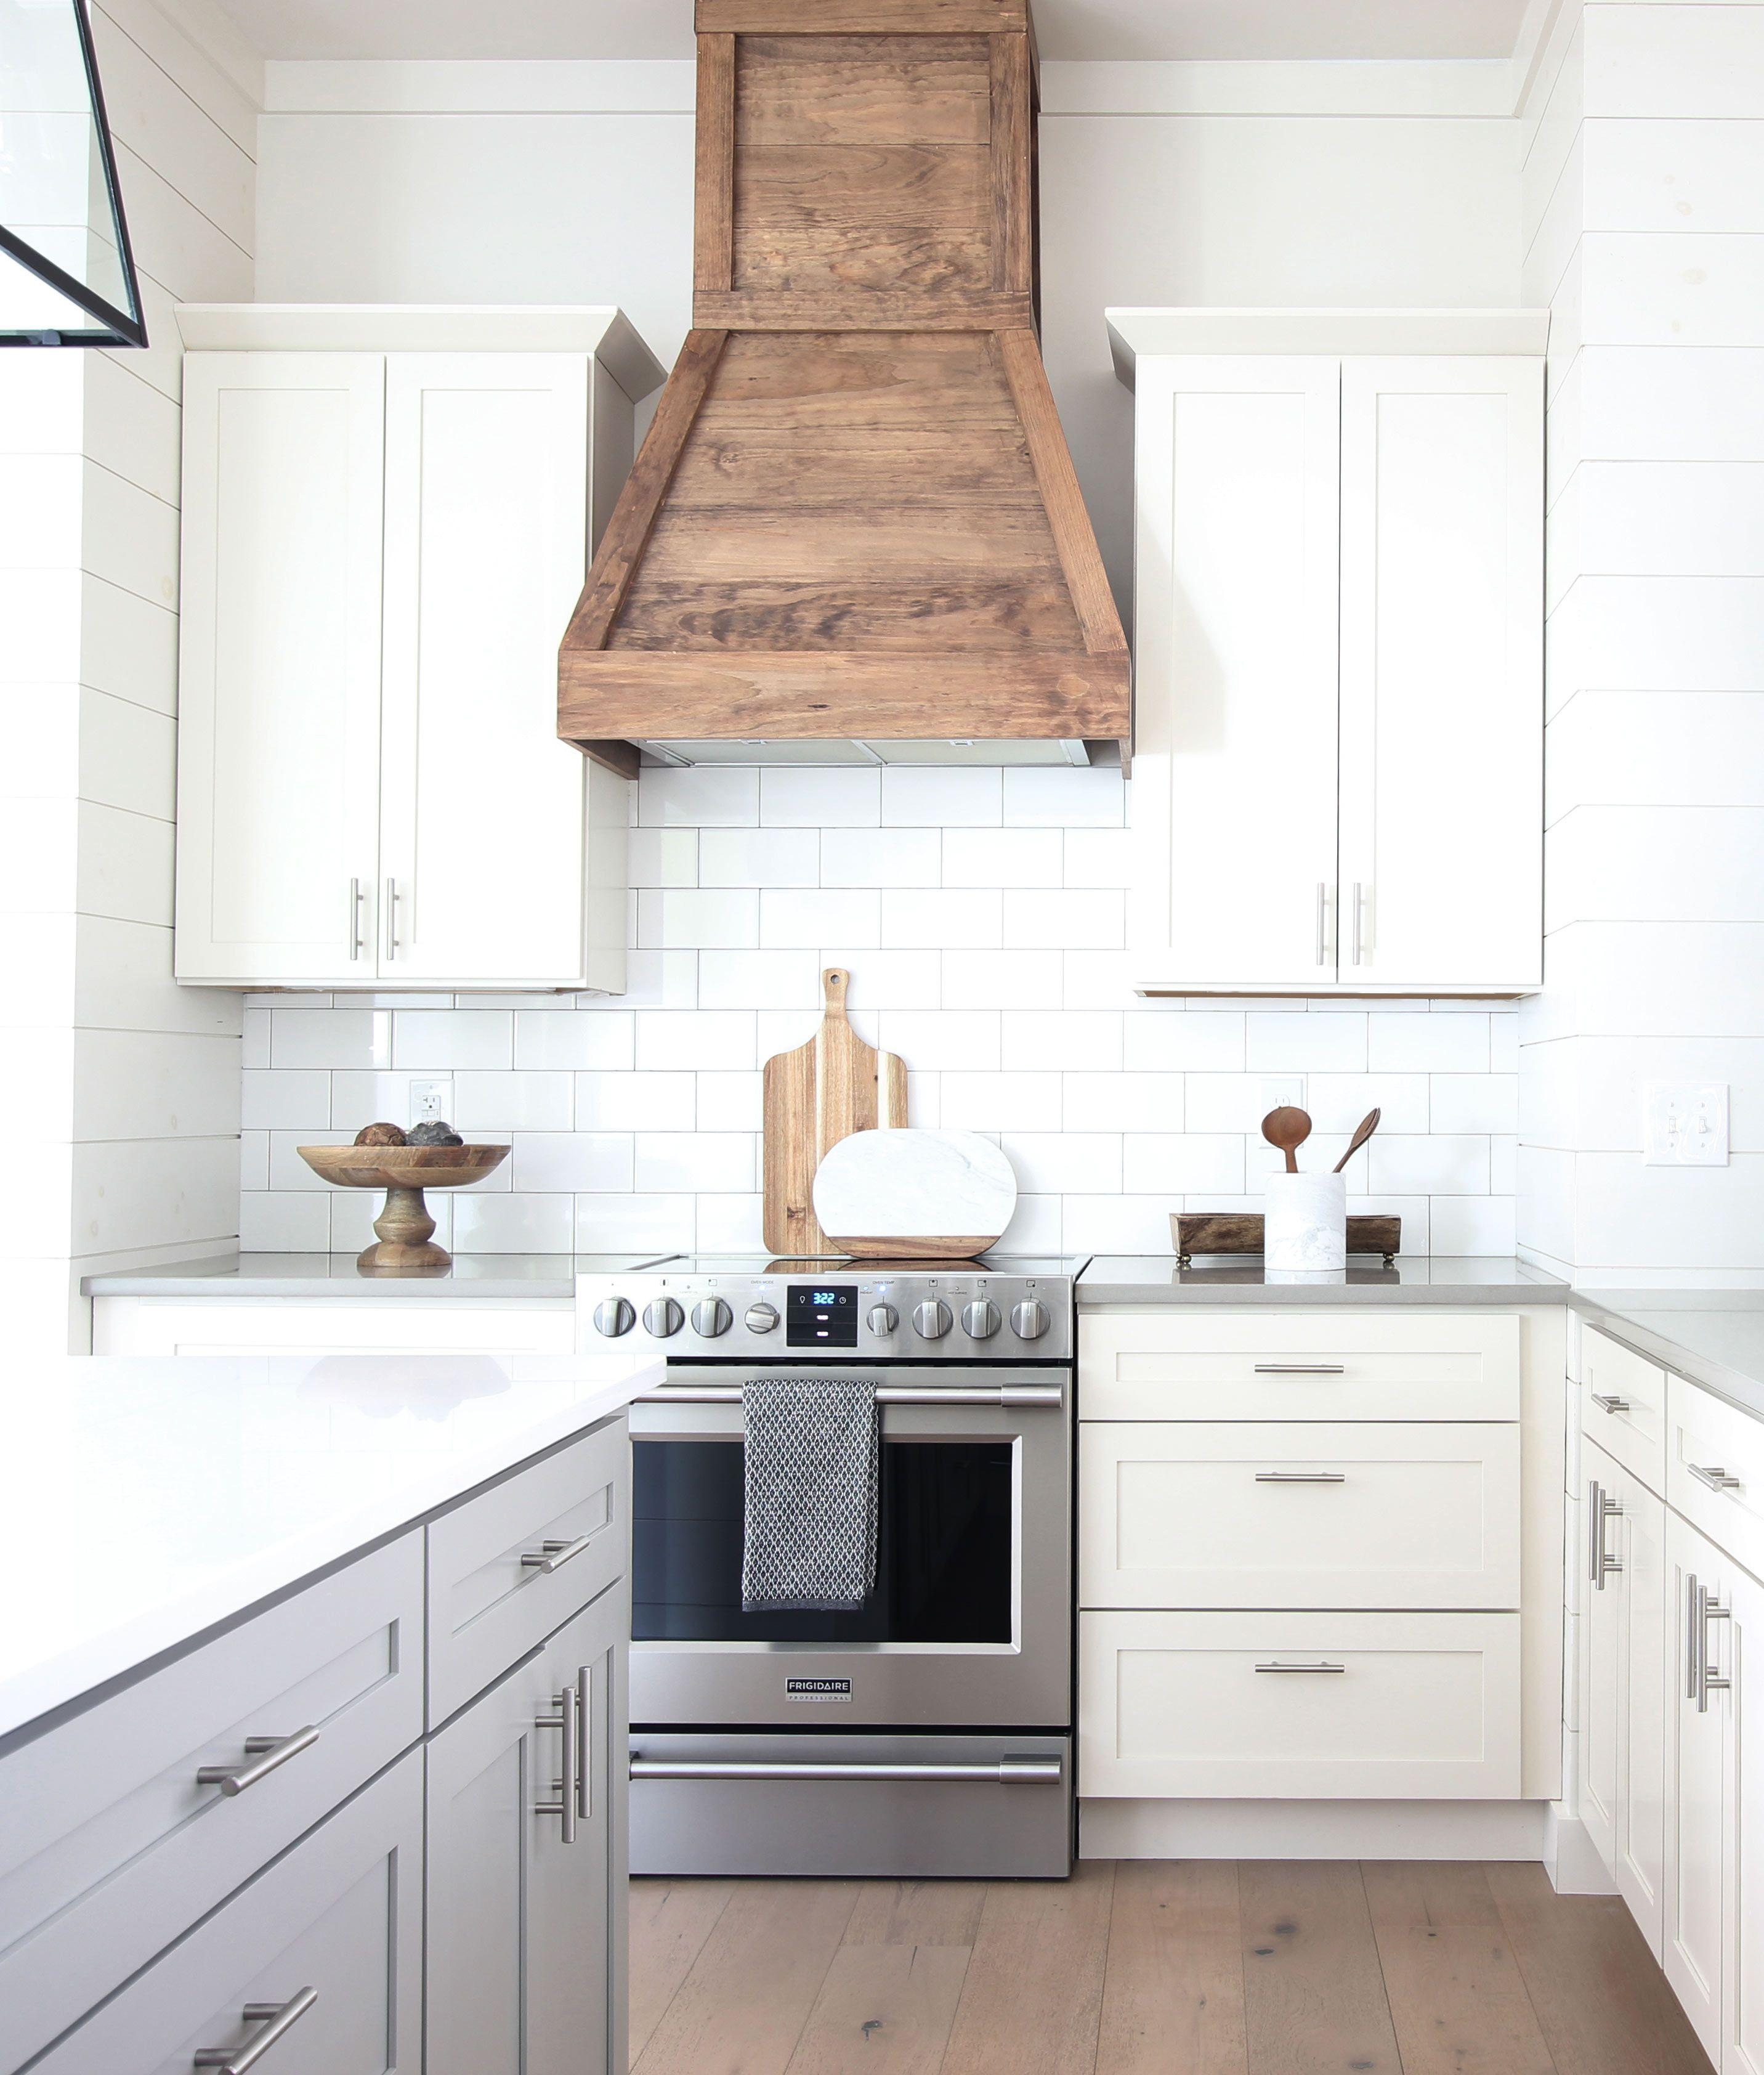 How To Build A Farmhouse Wood Range Hood Plank And Pillow Kitchen Renovation Kitchen Range Hood Kitchen Remodel